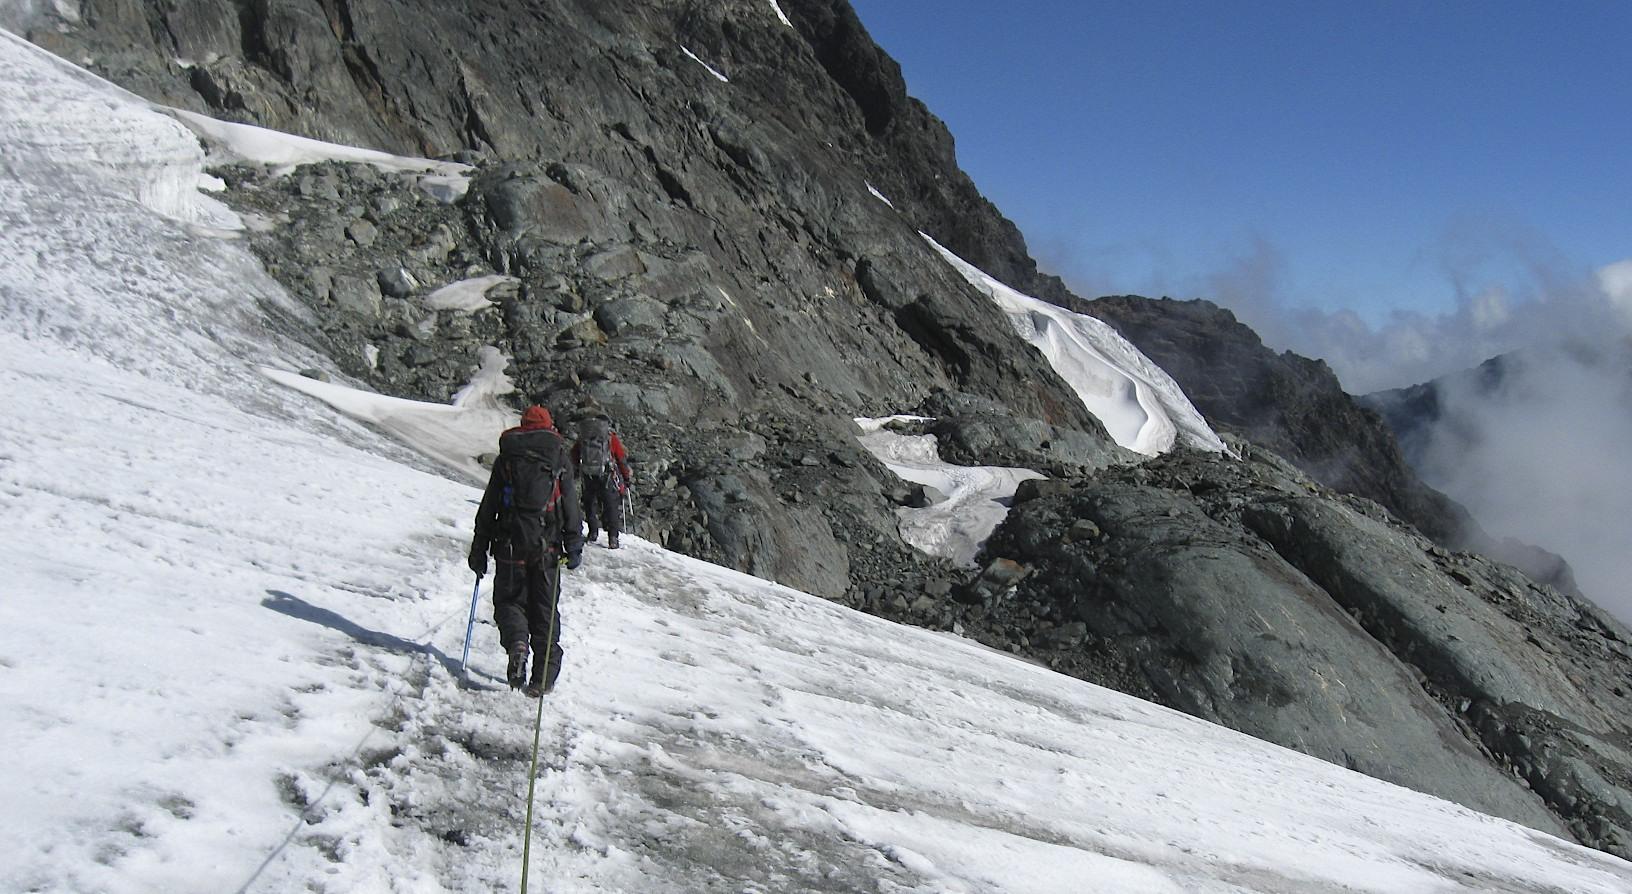 Summit ridge of Mt. Margarita